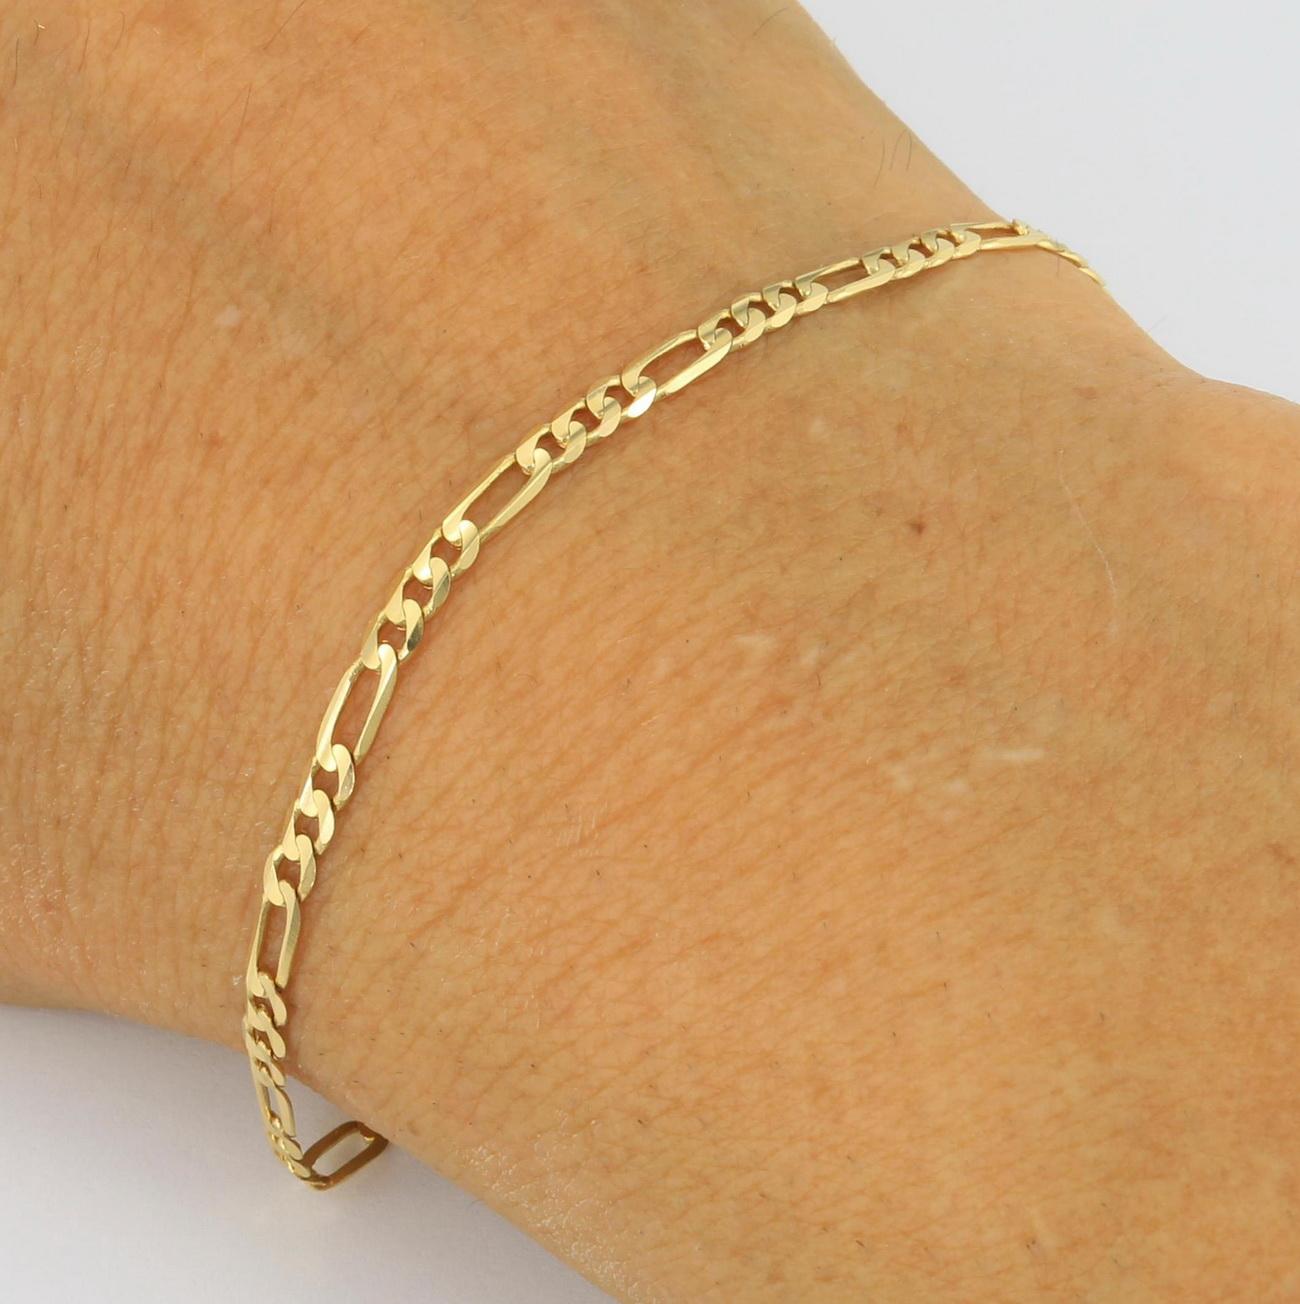 Womens 10K Yellow Gold 3.5mm Italian Figaro Chain Link Bracelet ... 362dd52c5648